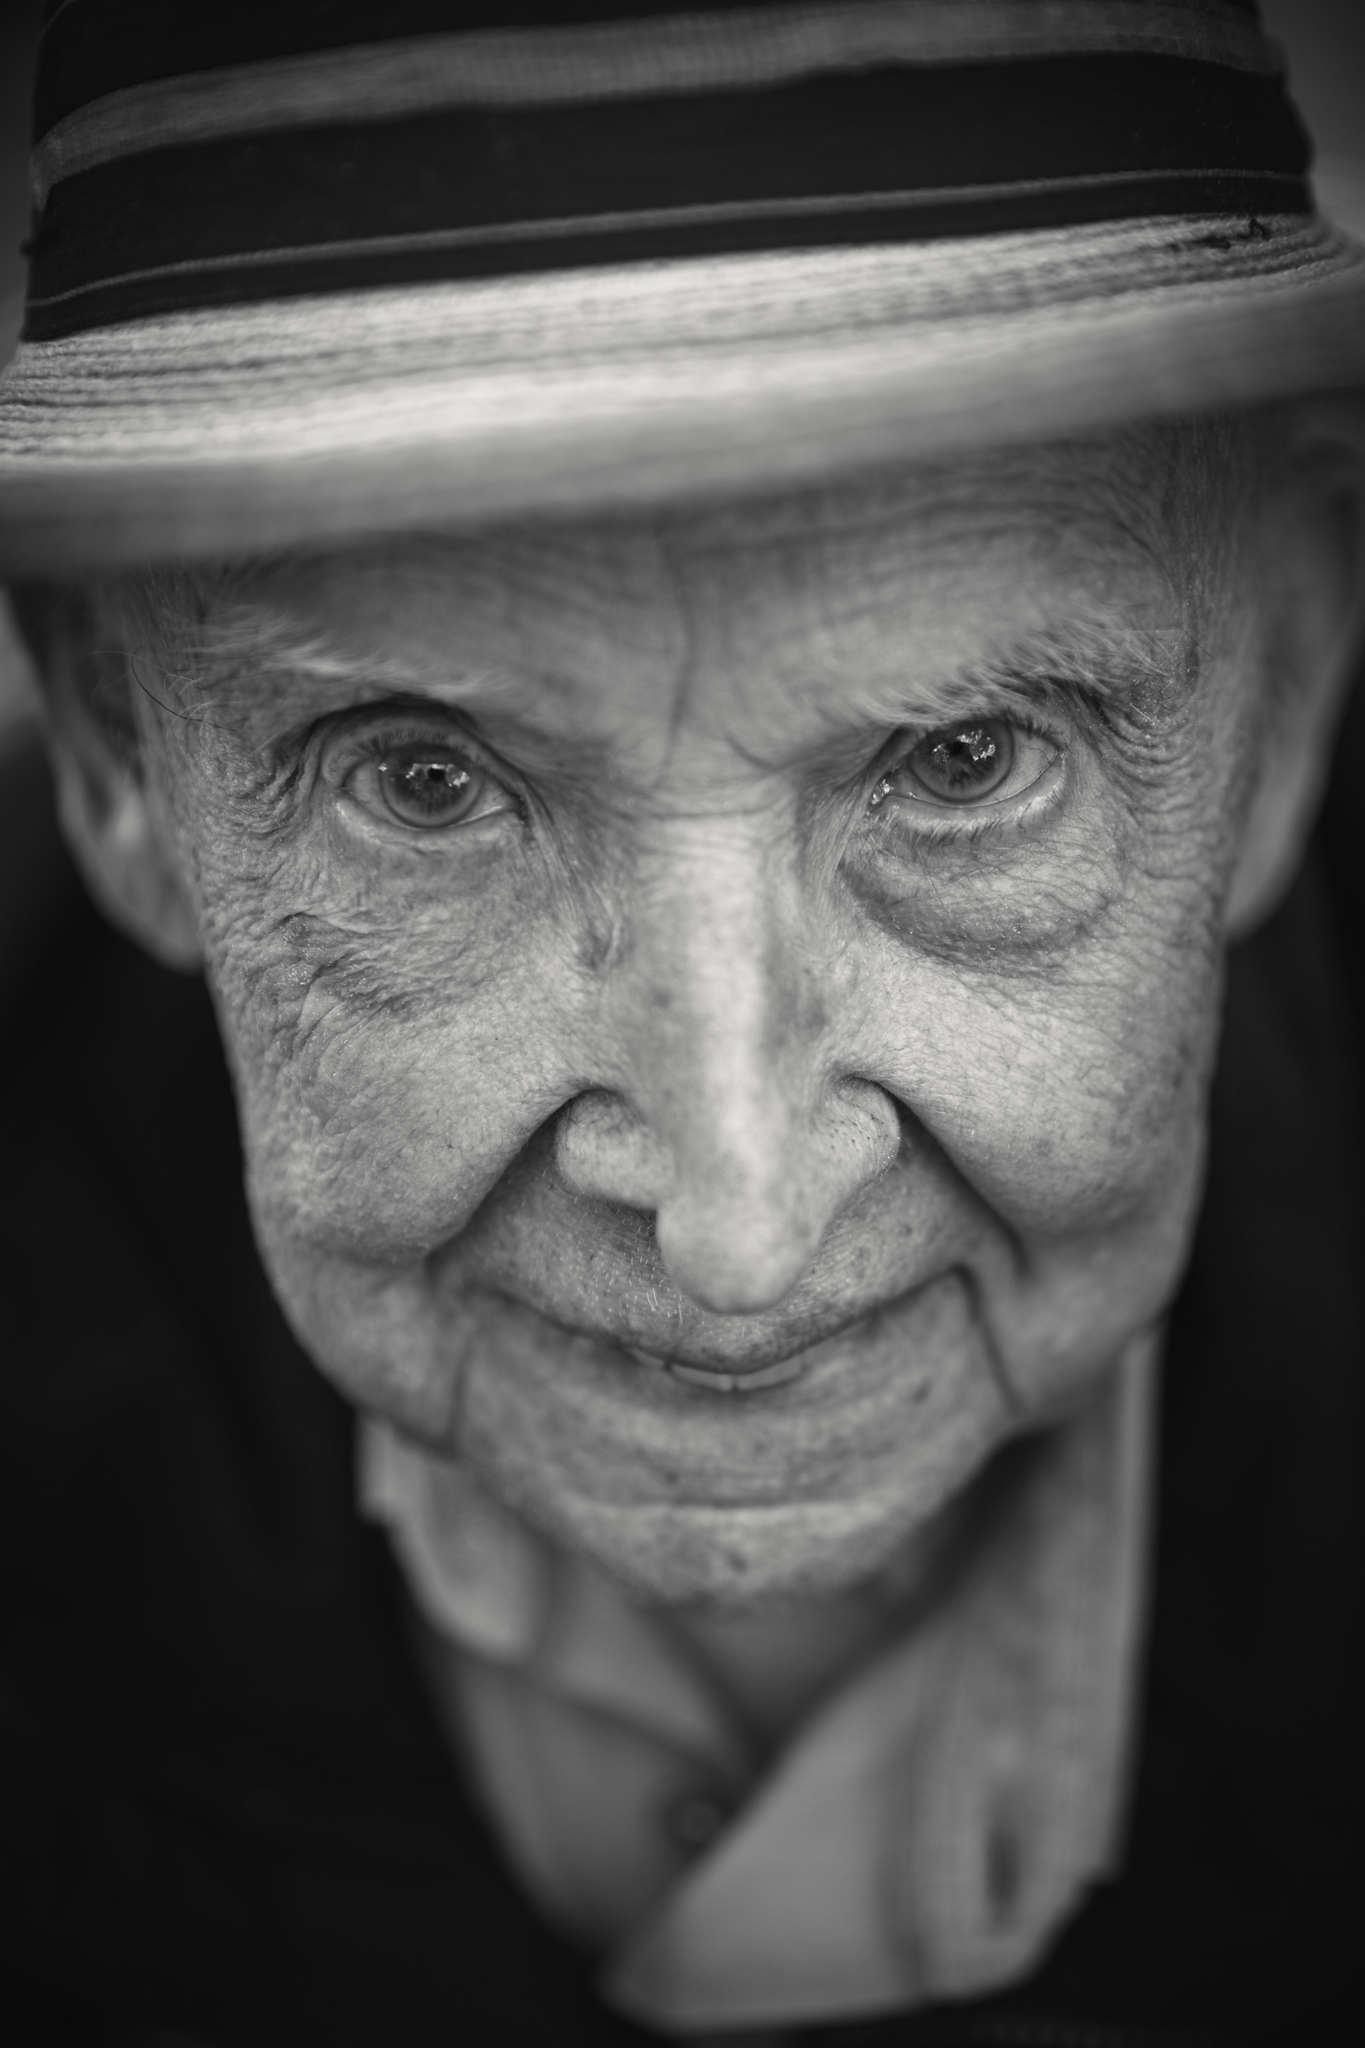 D-DAY VETERANS, FRANCE - JUNE 6: Jake Larson (96 yrs old), from Martinez in California, a member of